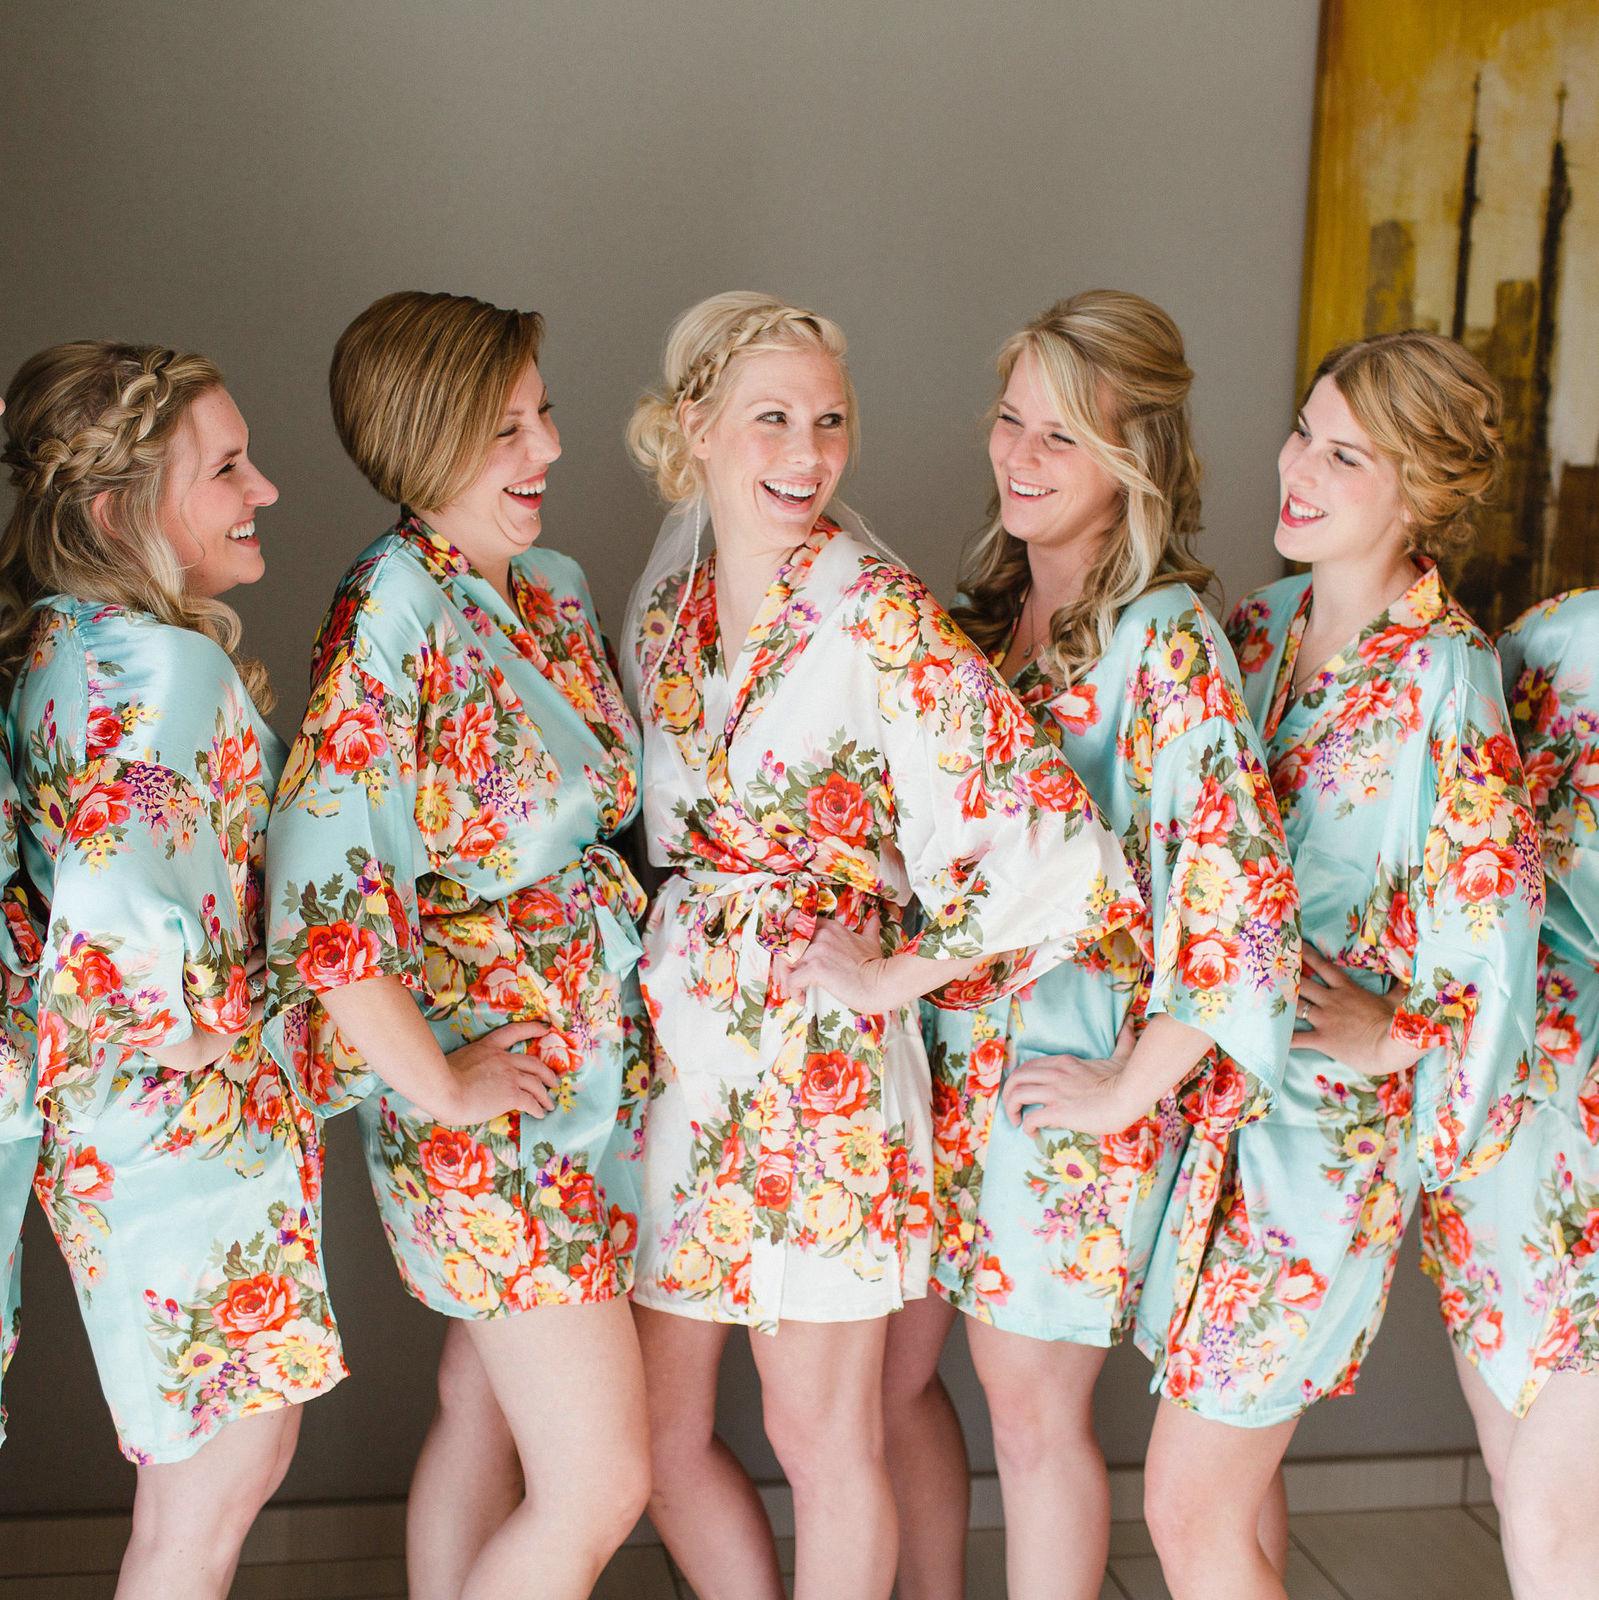 Floral satin robe bridesmaid robes gowns bride bath robe, wedding kimono robe